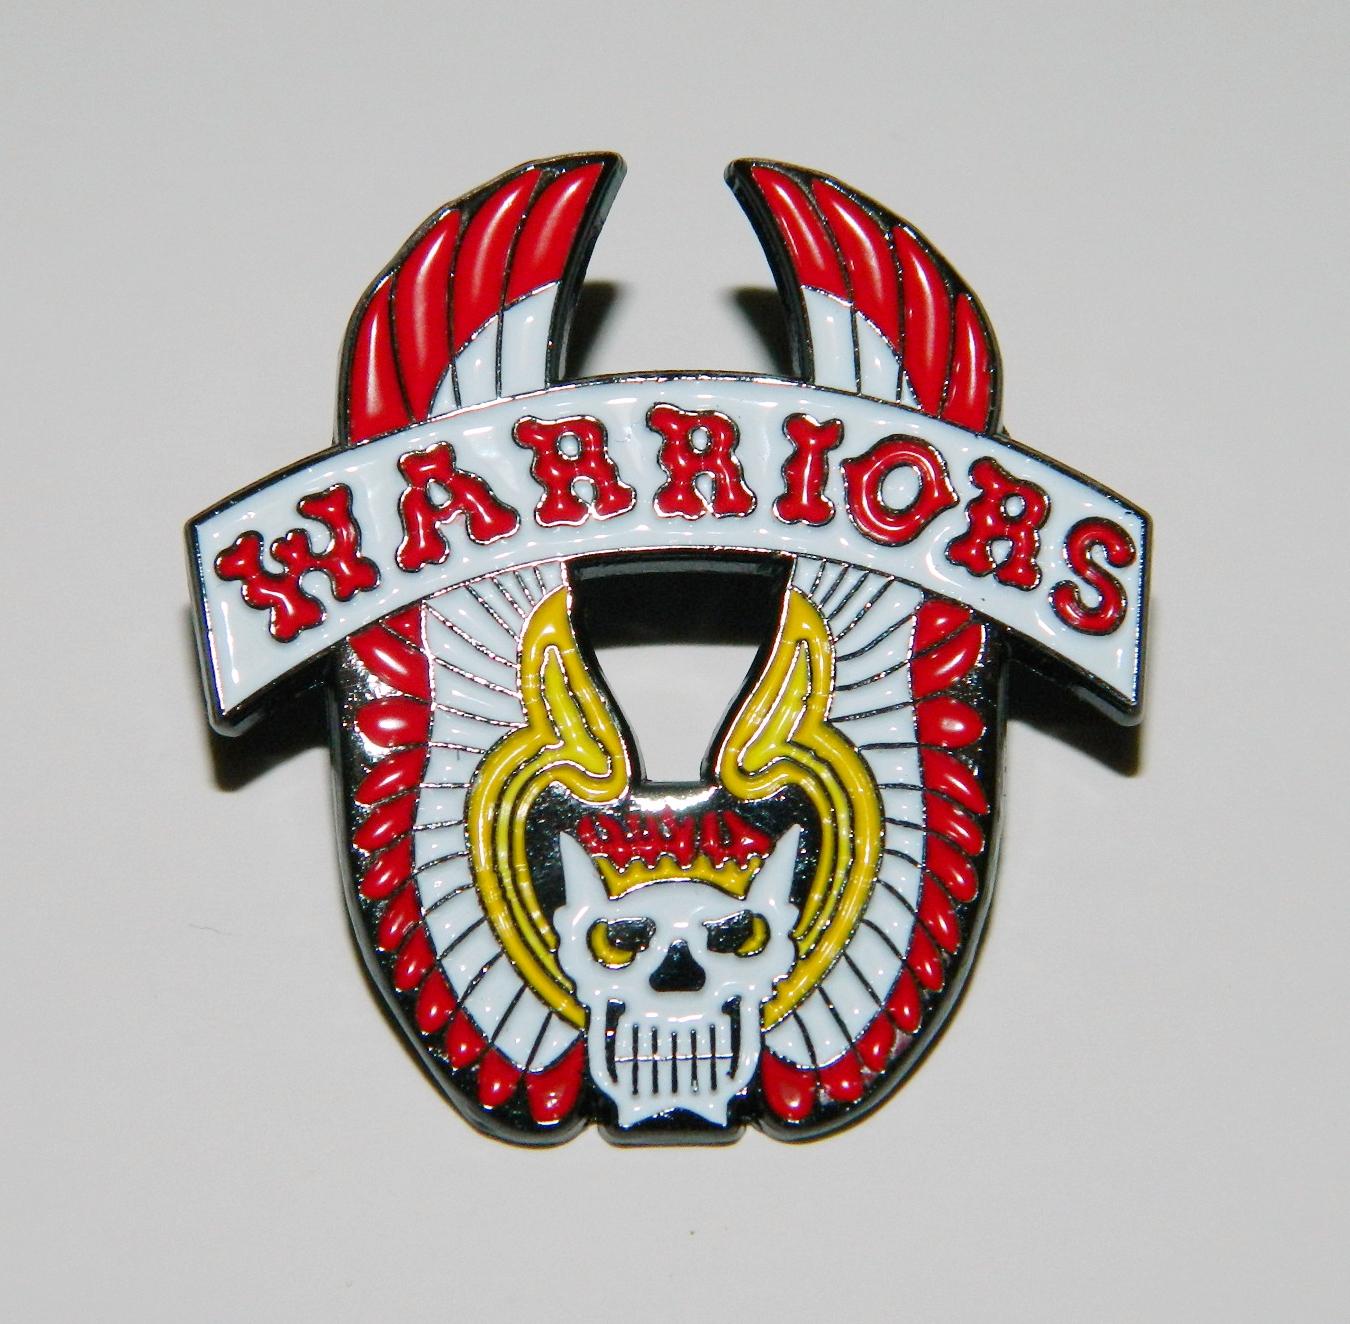 The Warriors Movie Winged Skull Jacket Logo Metal Enamel Pin NEW UNUSED.